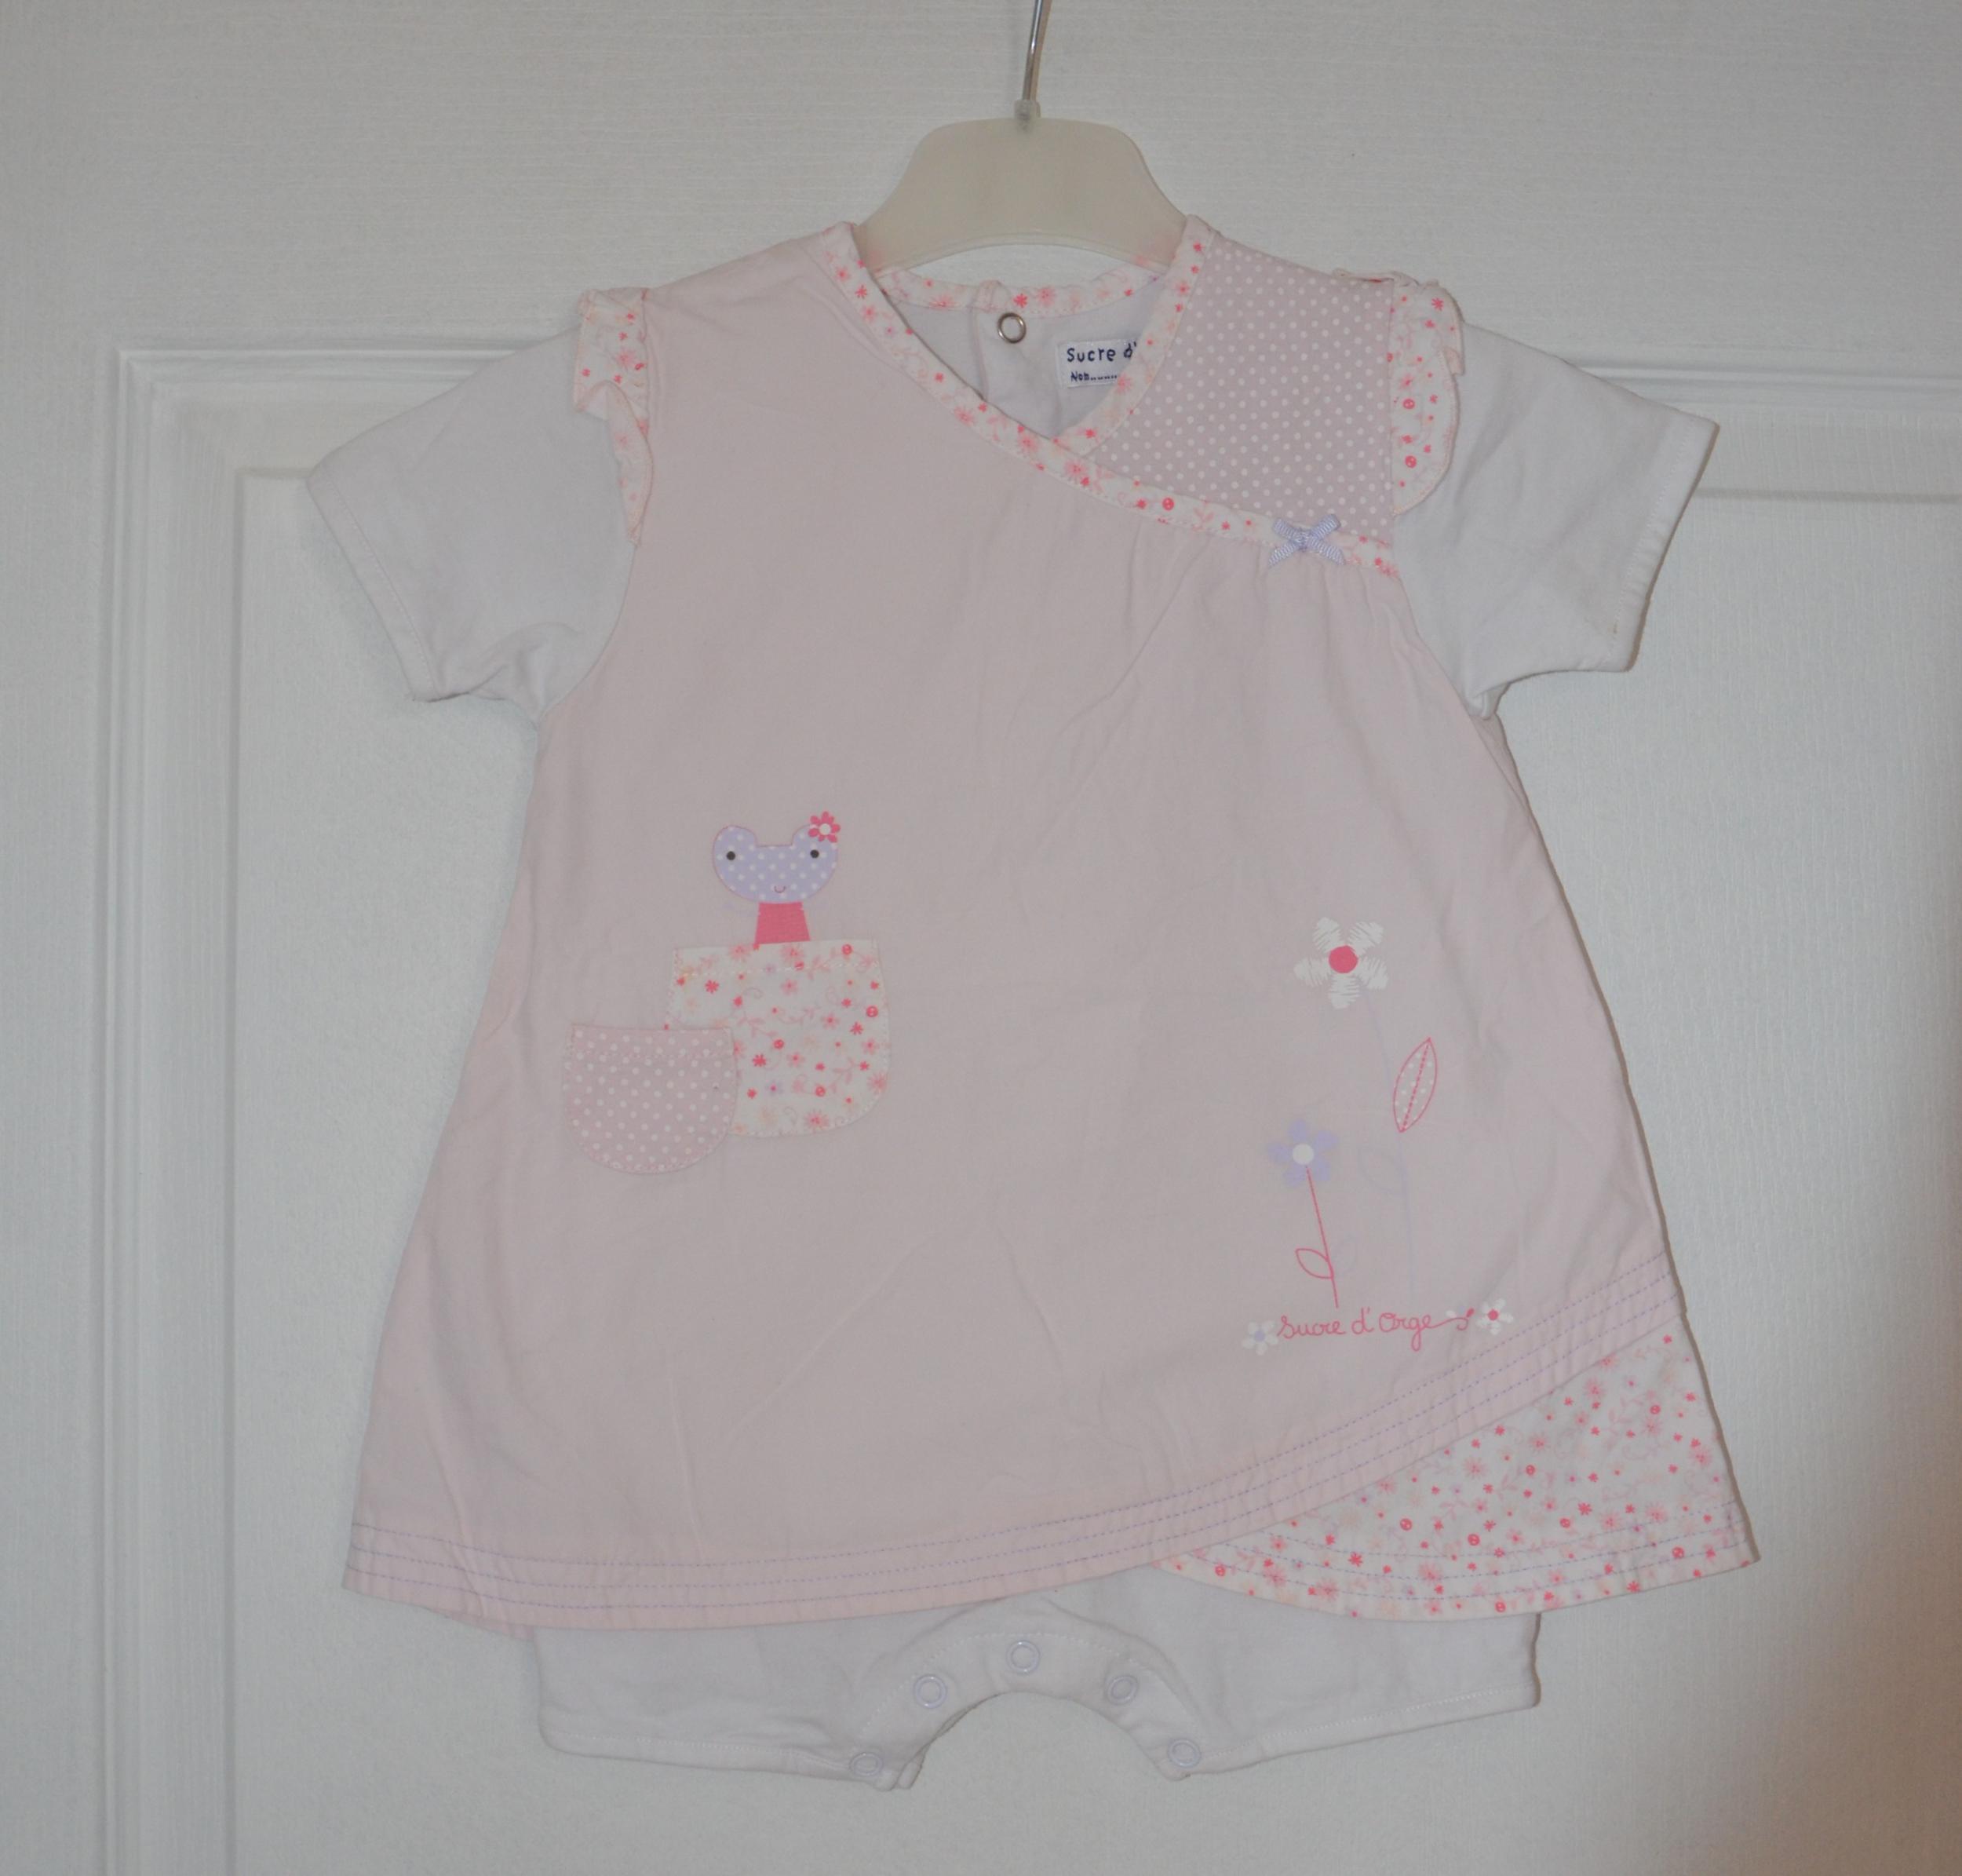 combishort fille 9 mois sucre d orge rose